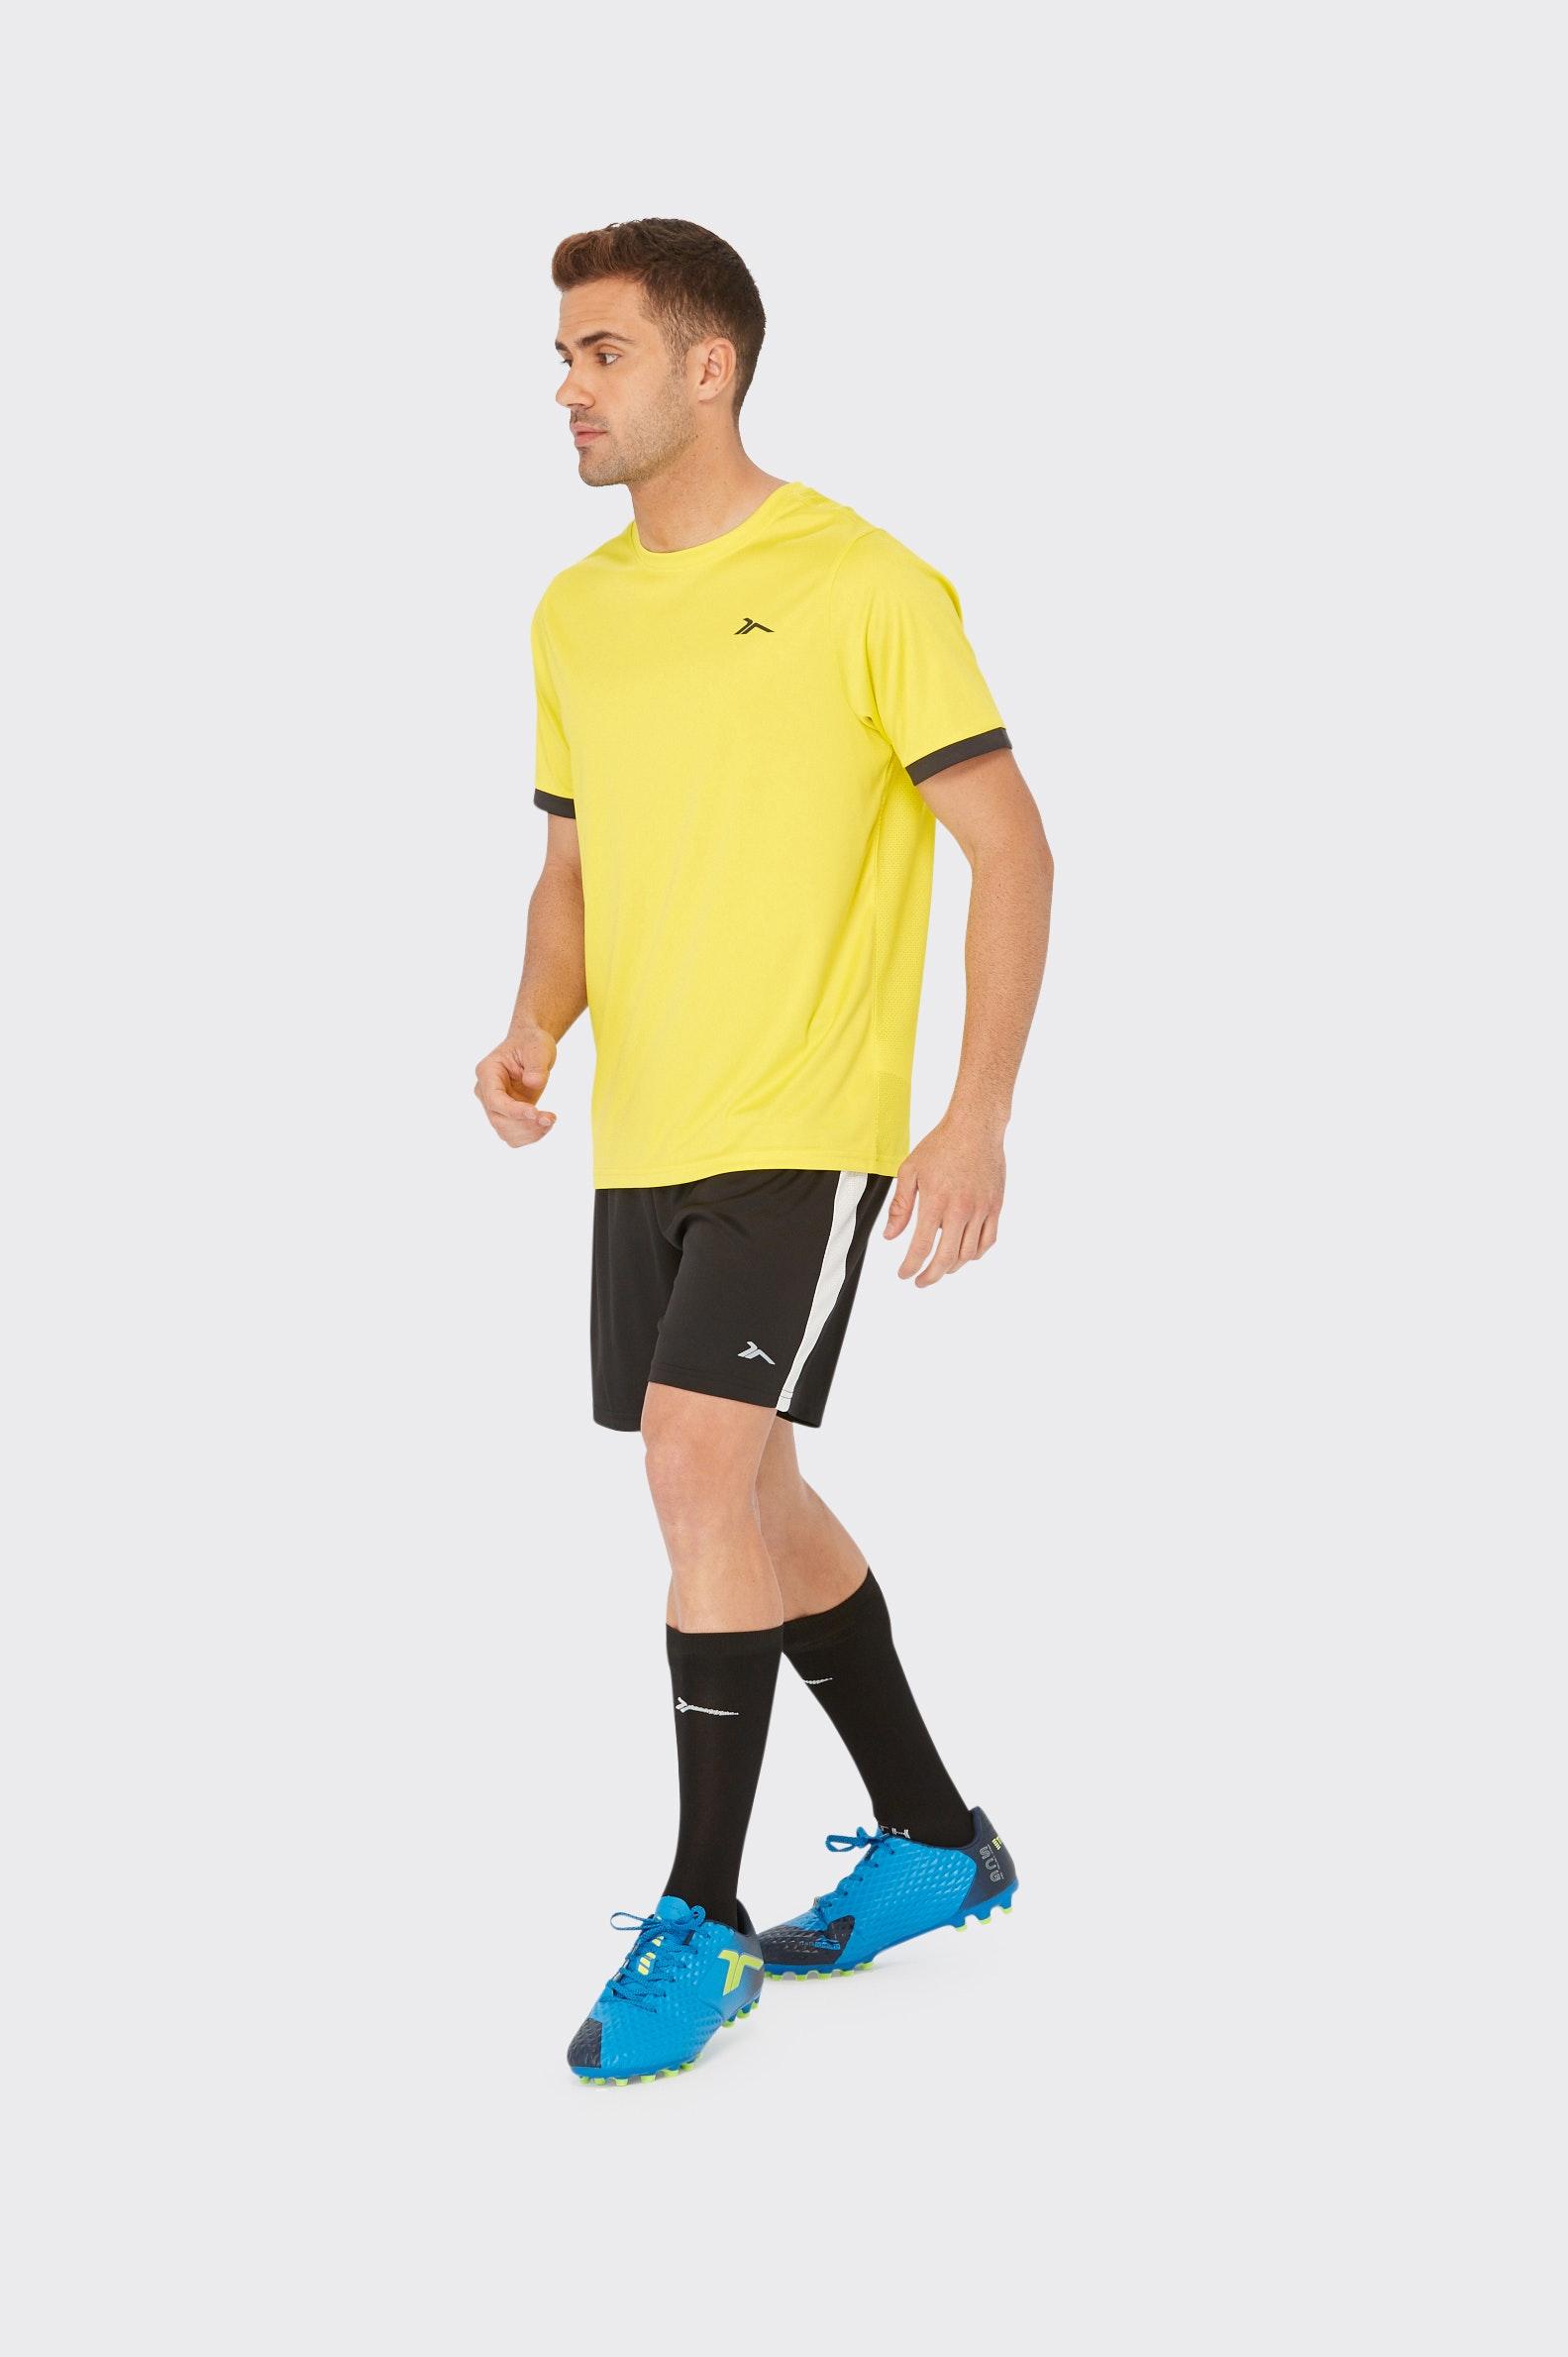 T-SHIRT FOOTBALL TENTH PLAY ELABORADA HOMME